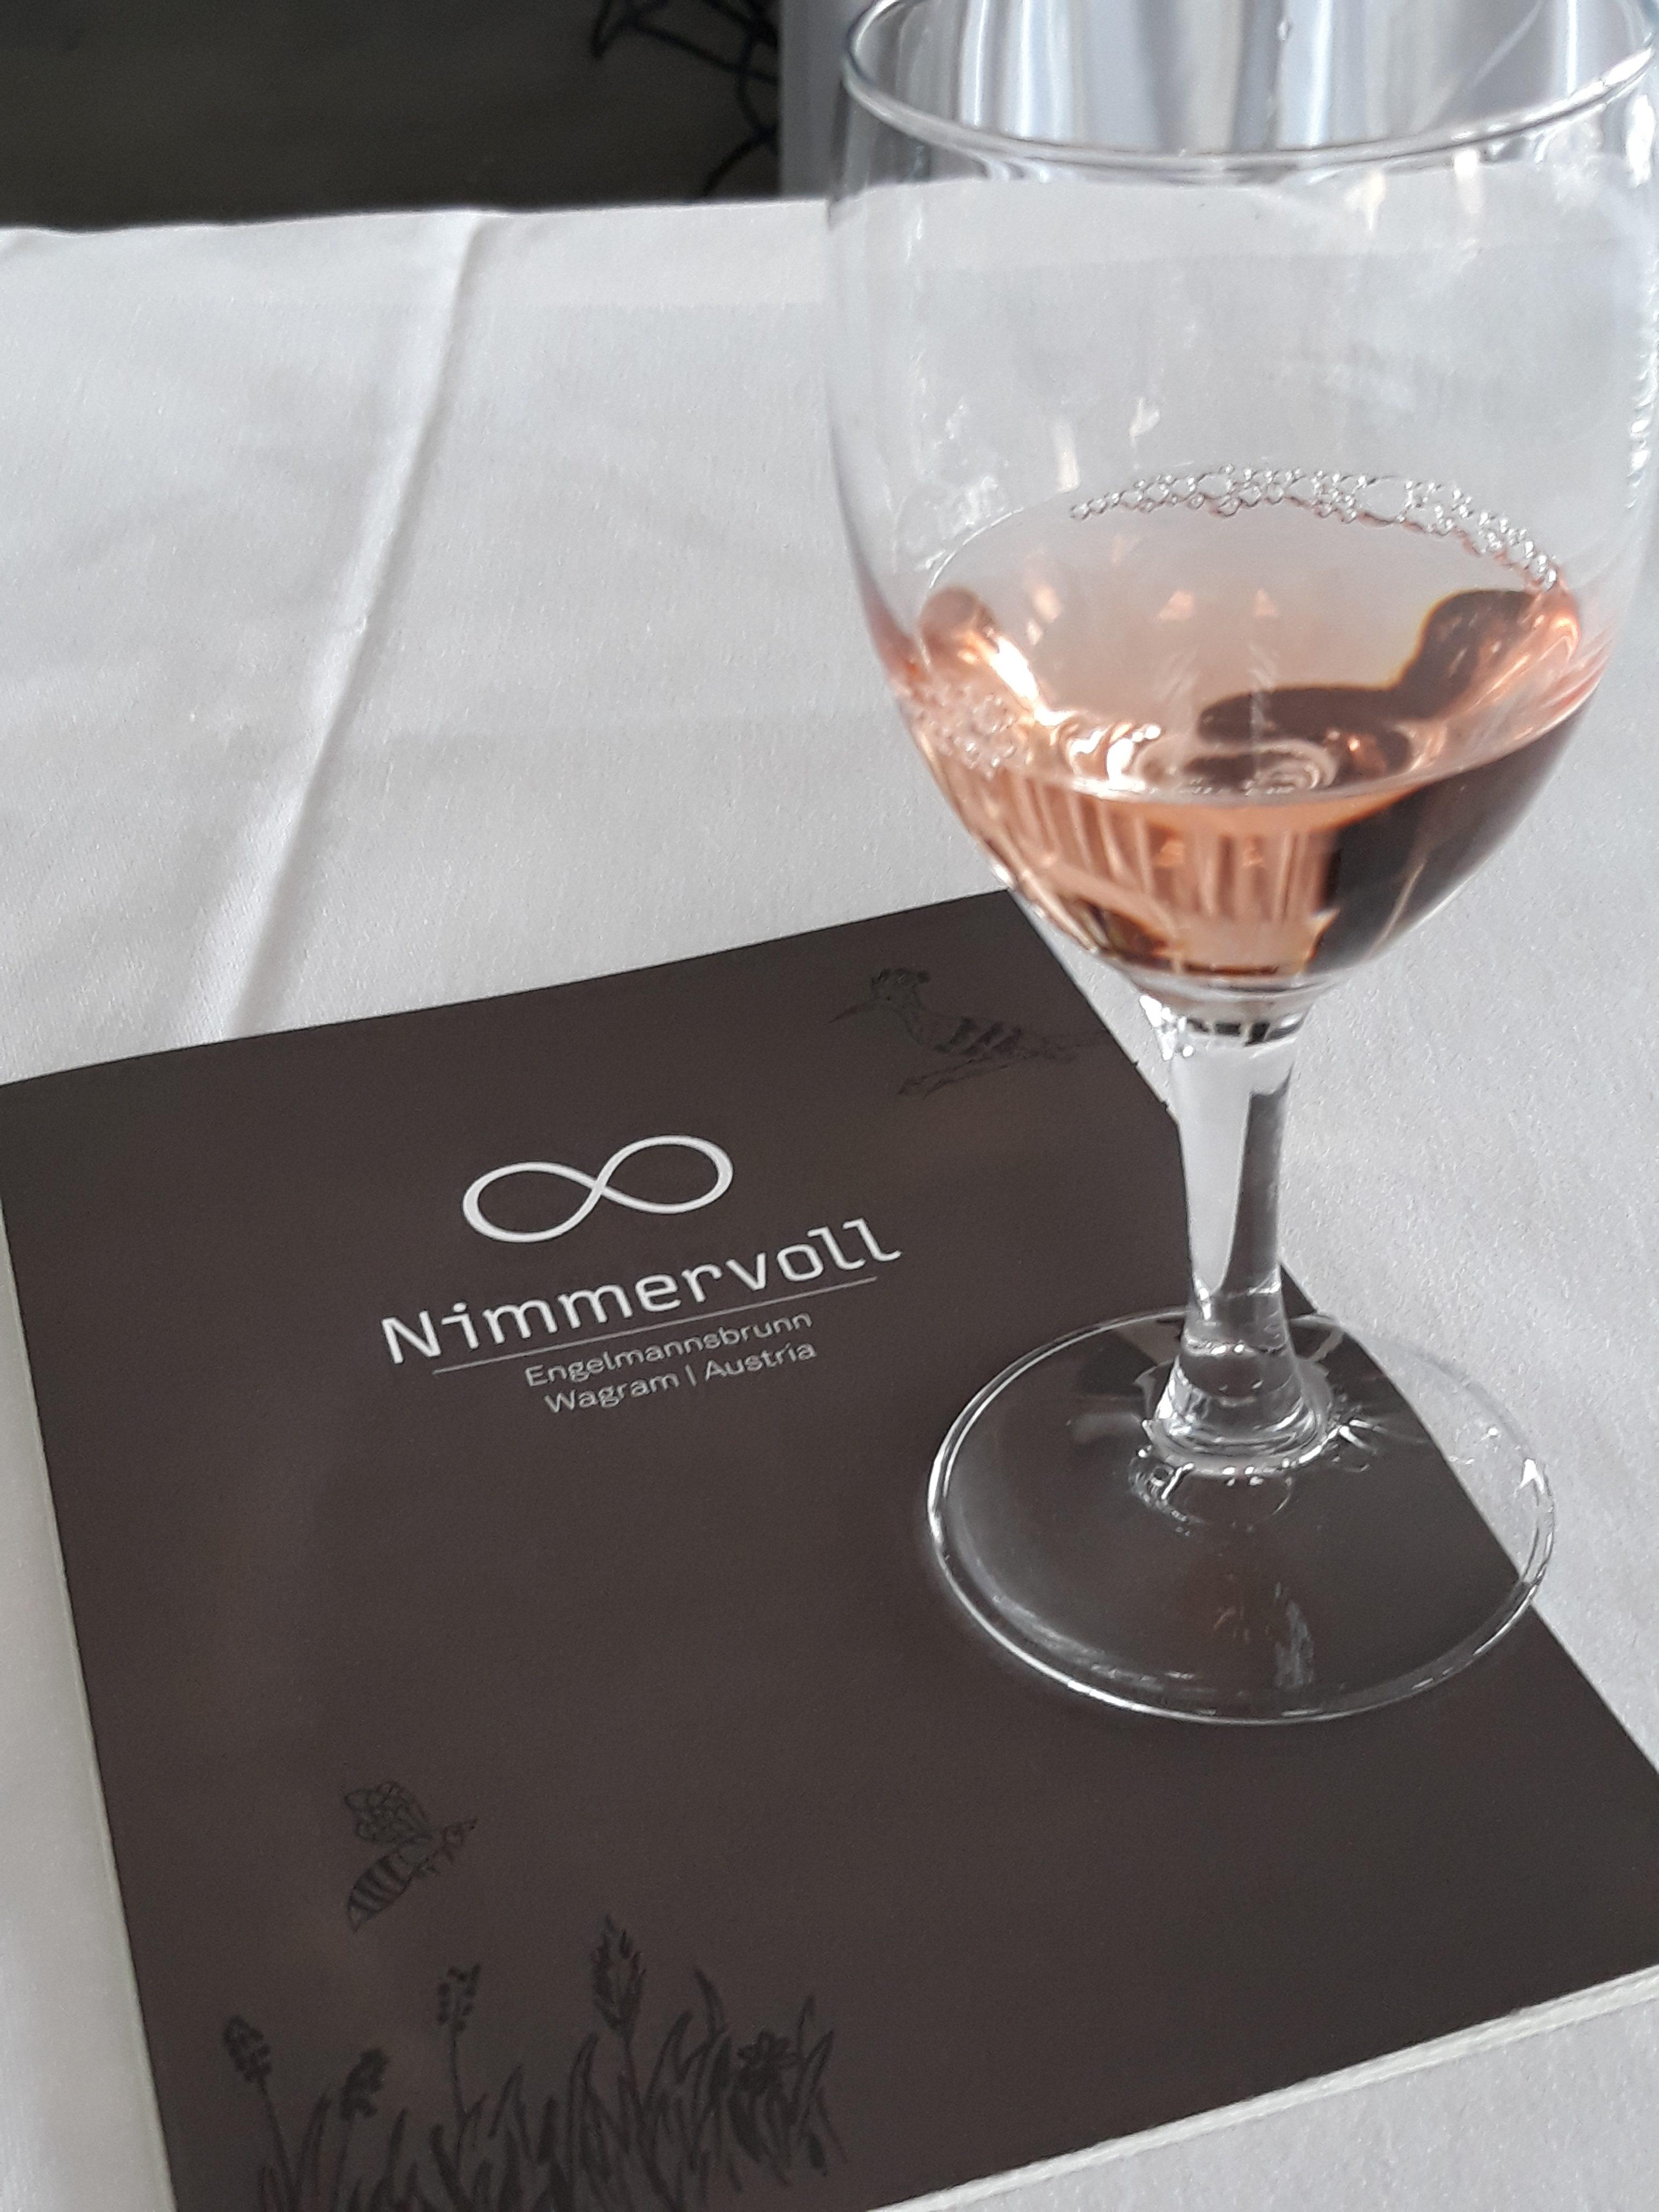 Gastronomy Slovakia 2018: Ochutnávka vína Nimmervoll na úrovni